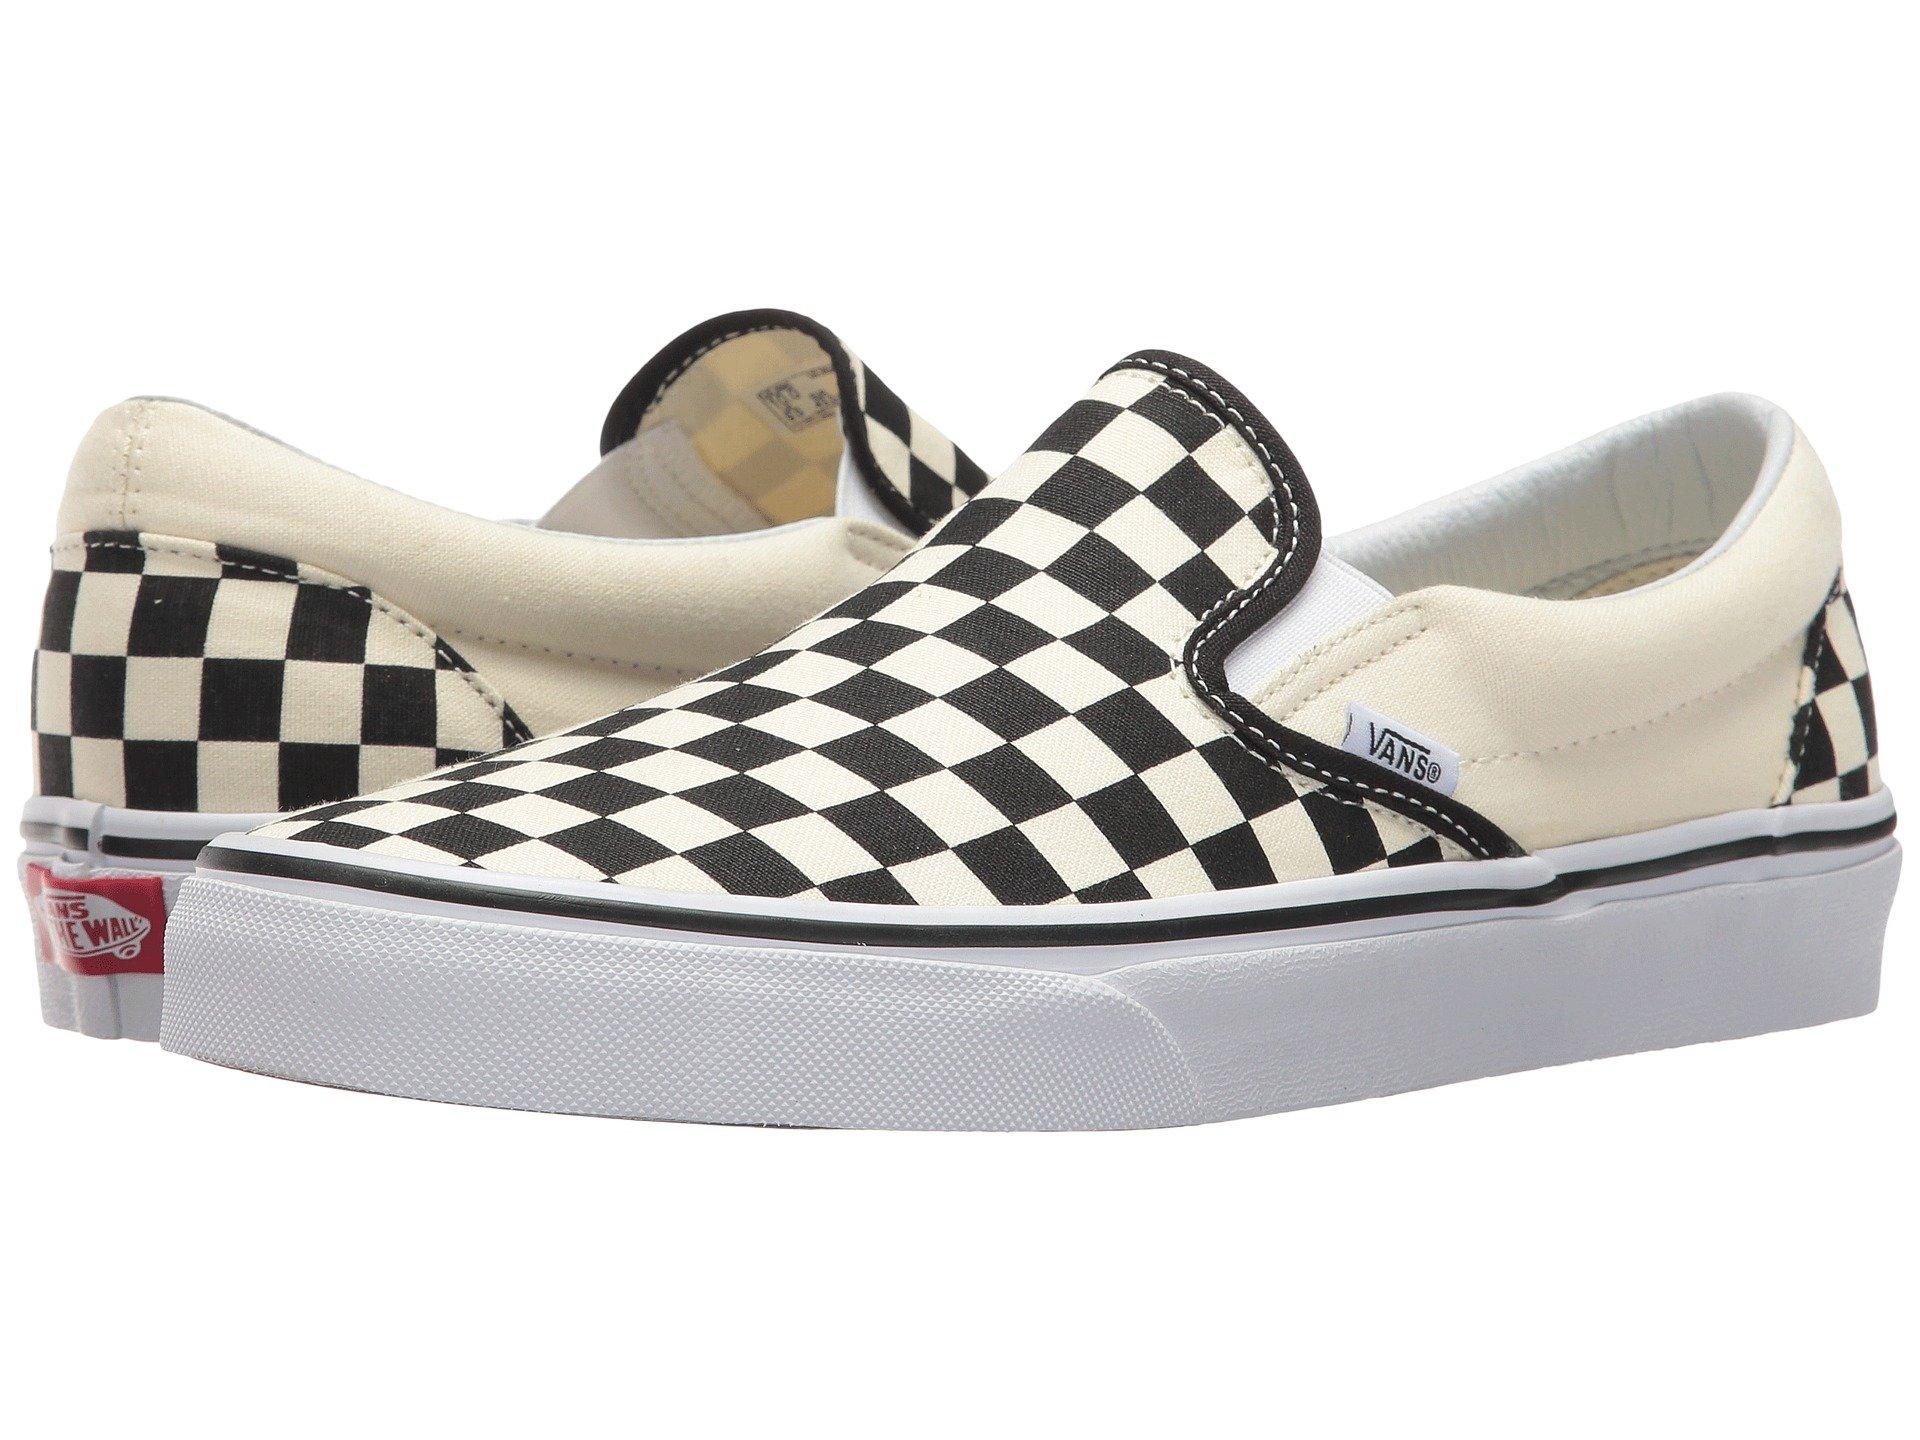 Vans Checkerboard Slip-On Unisex Black